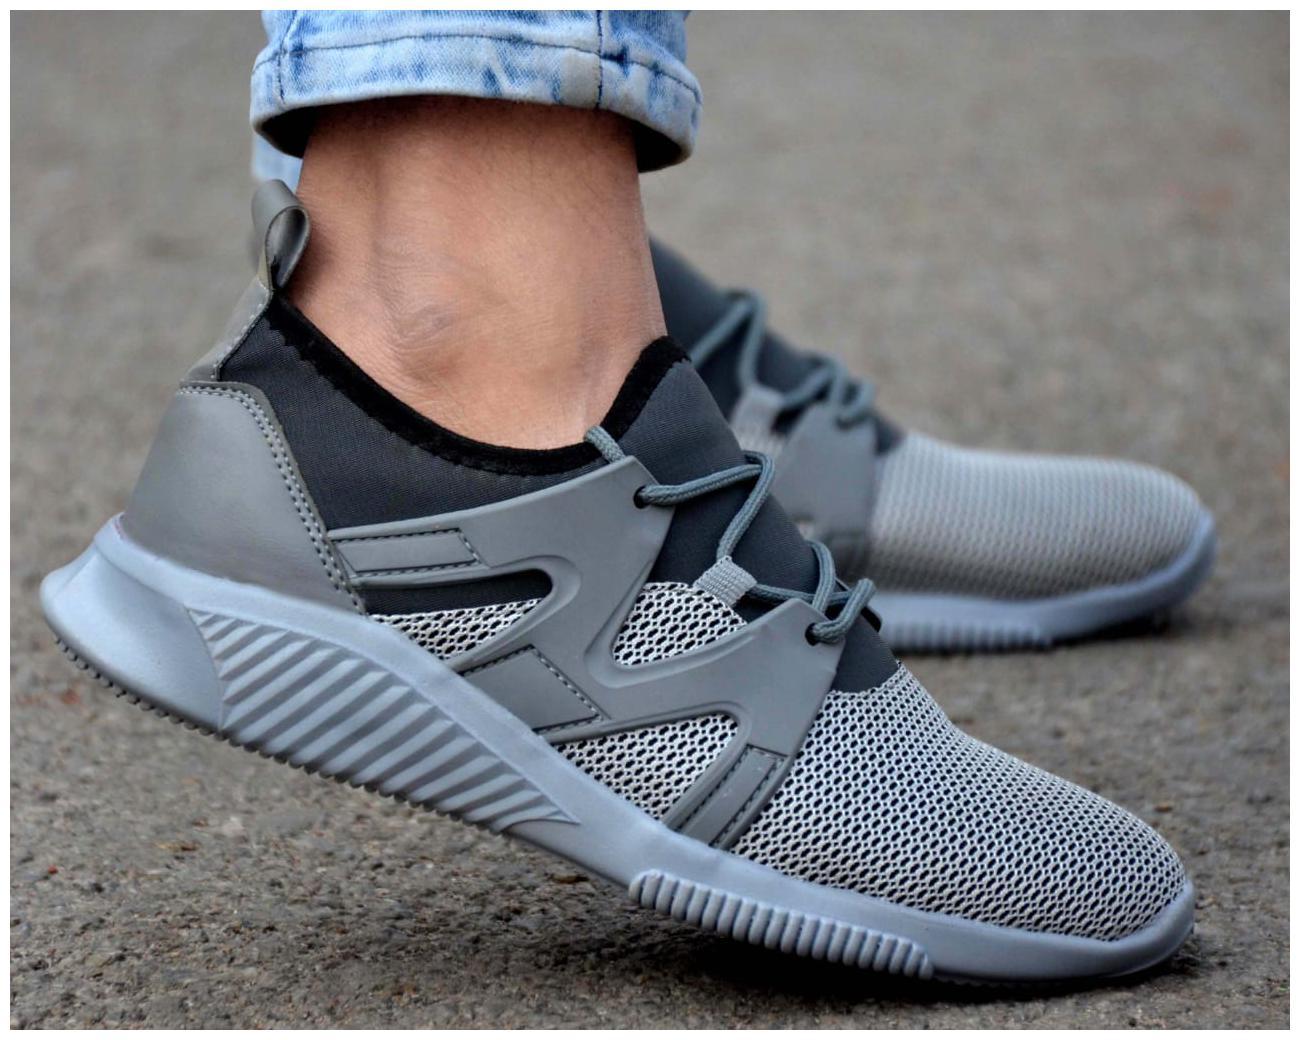 Woakers Men's Grey Sport Shoes